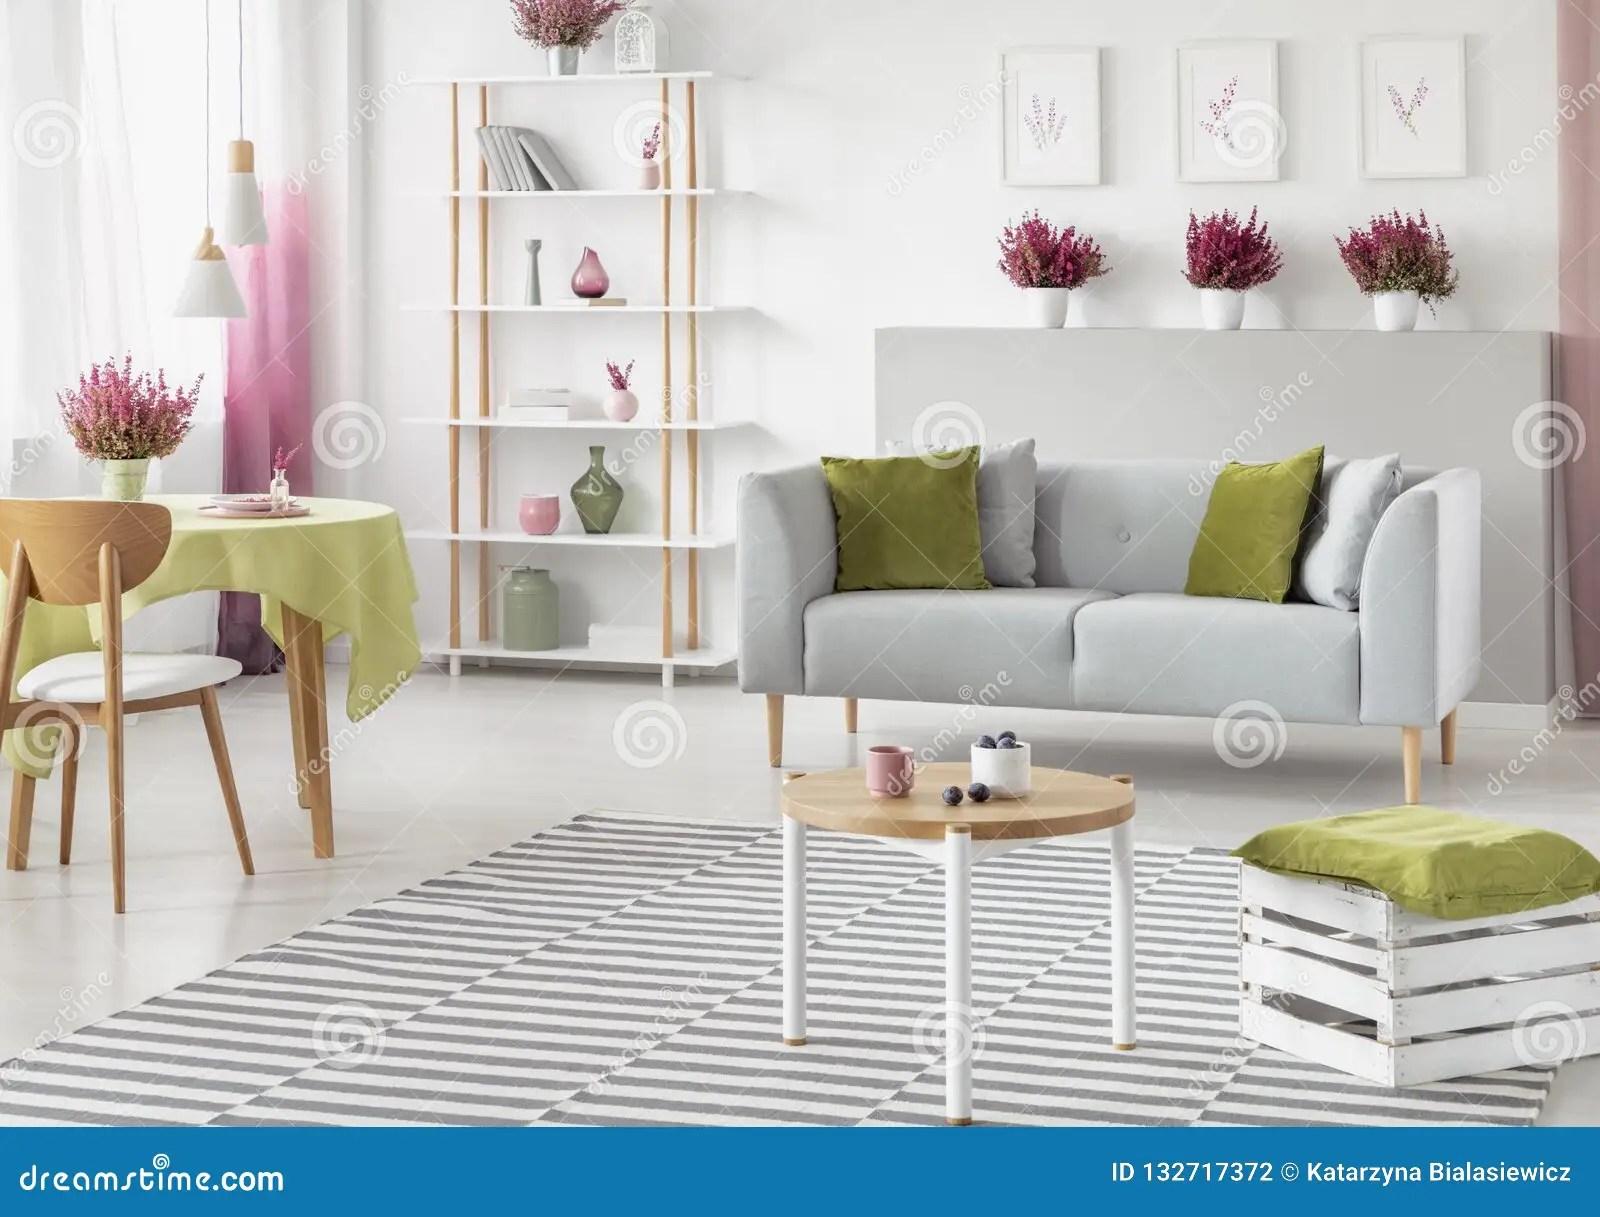 Witte Houten Bank Eettafel.Houten Keukenbank Bank Eettafel Ikea